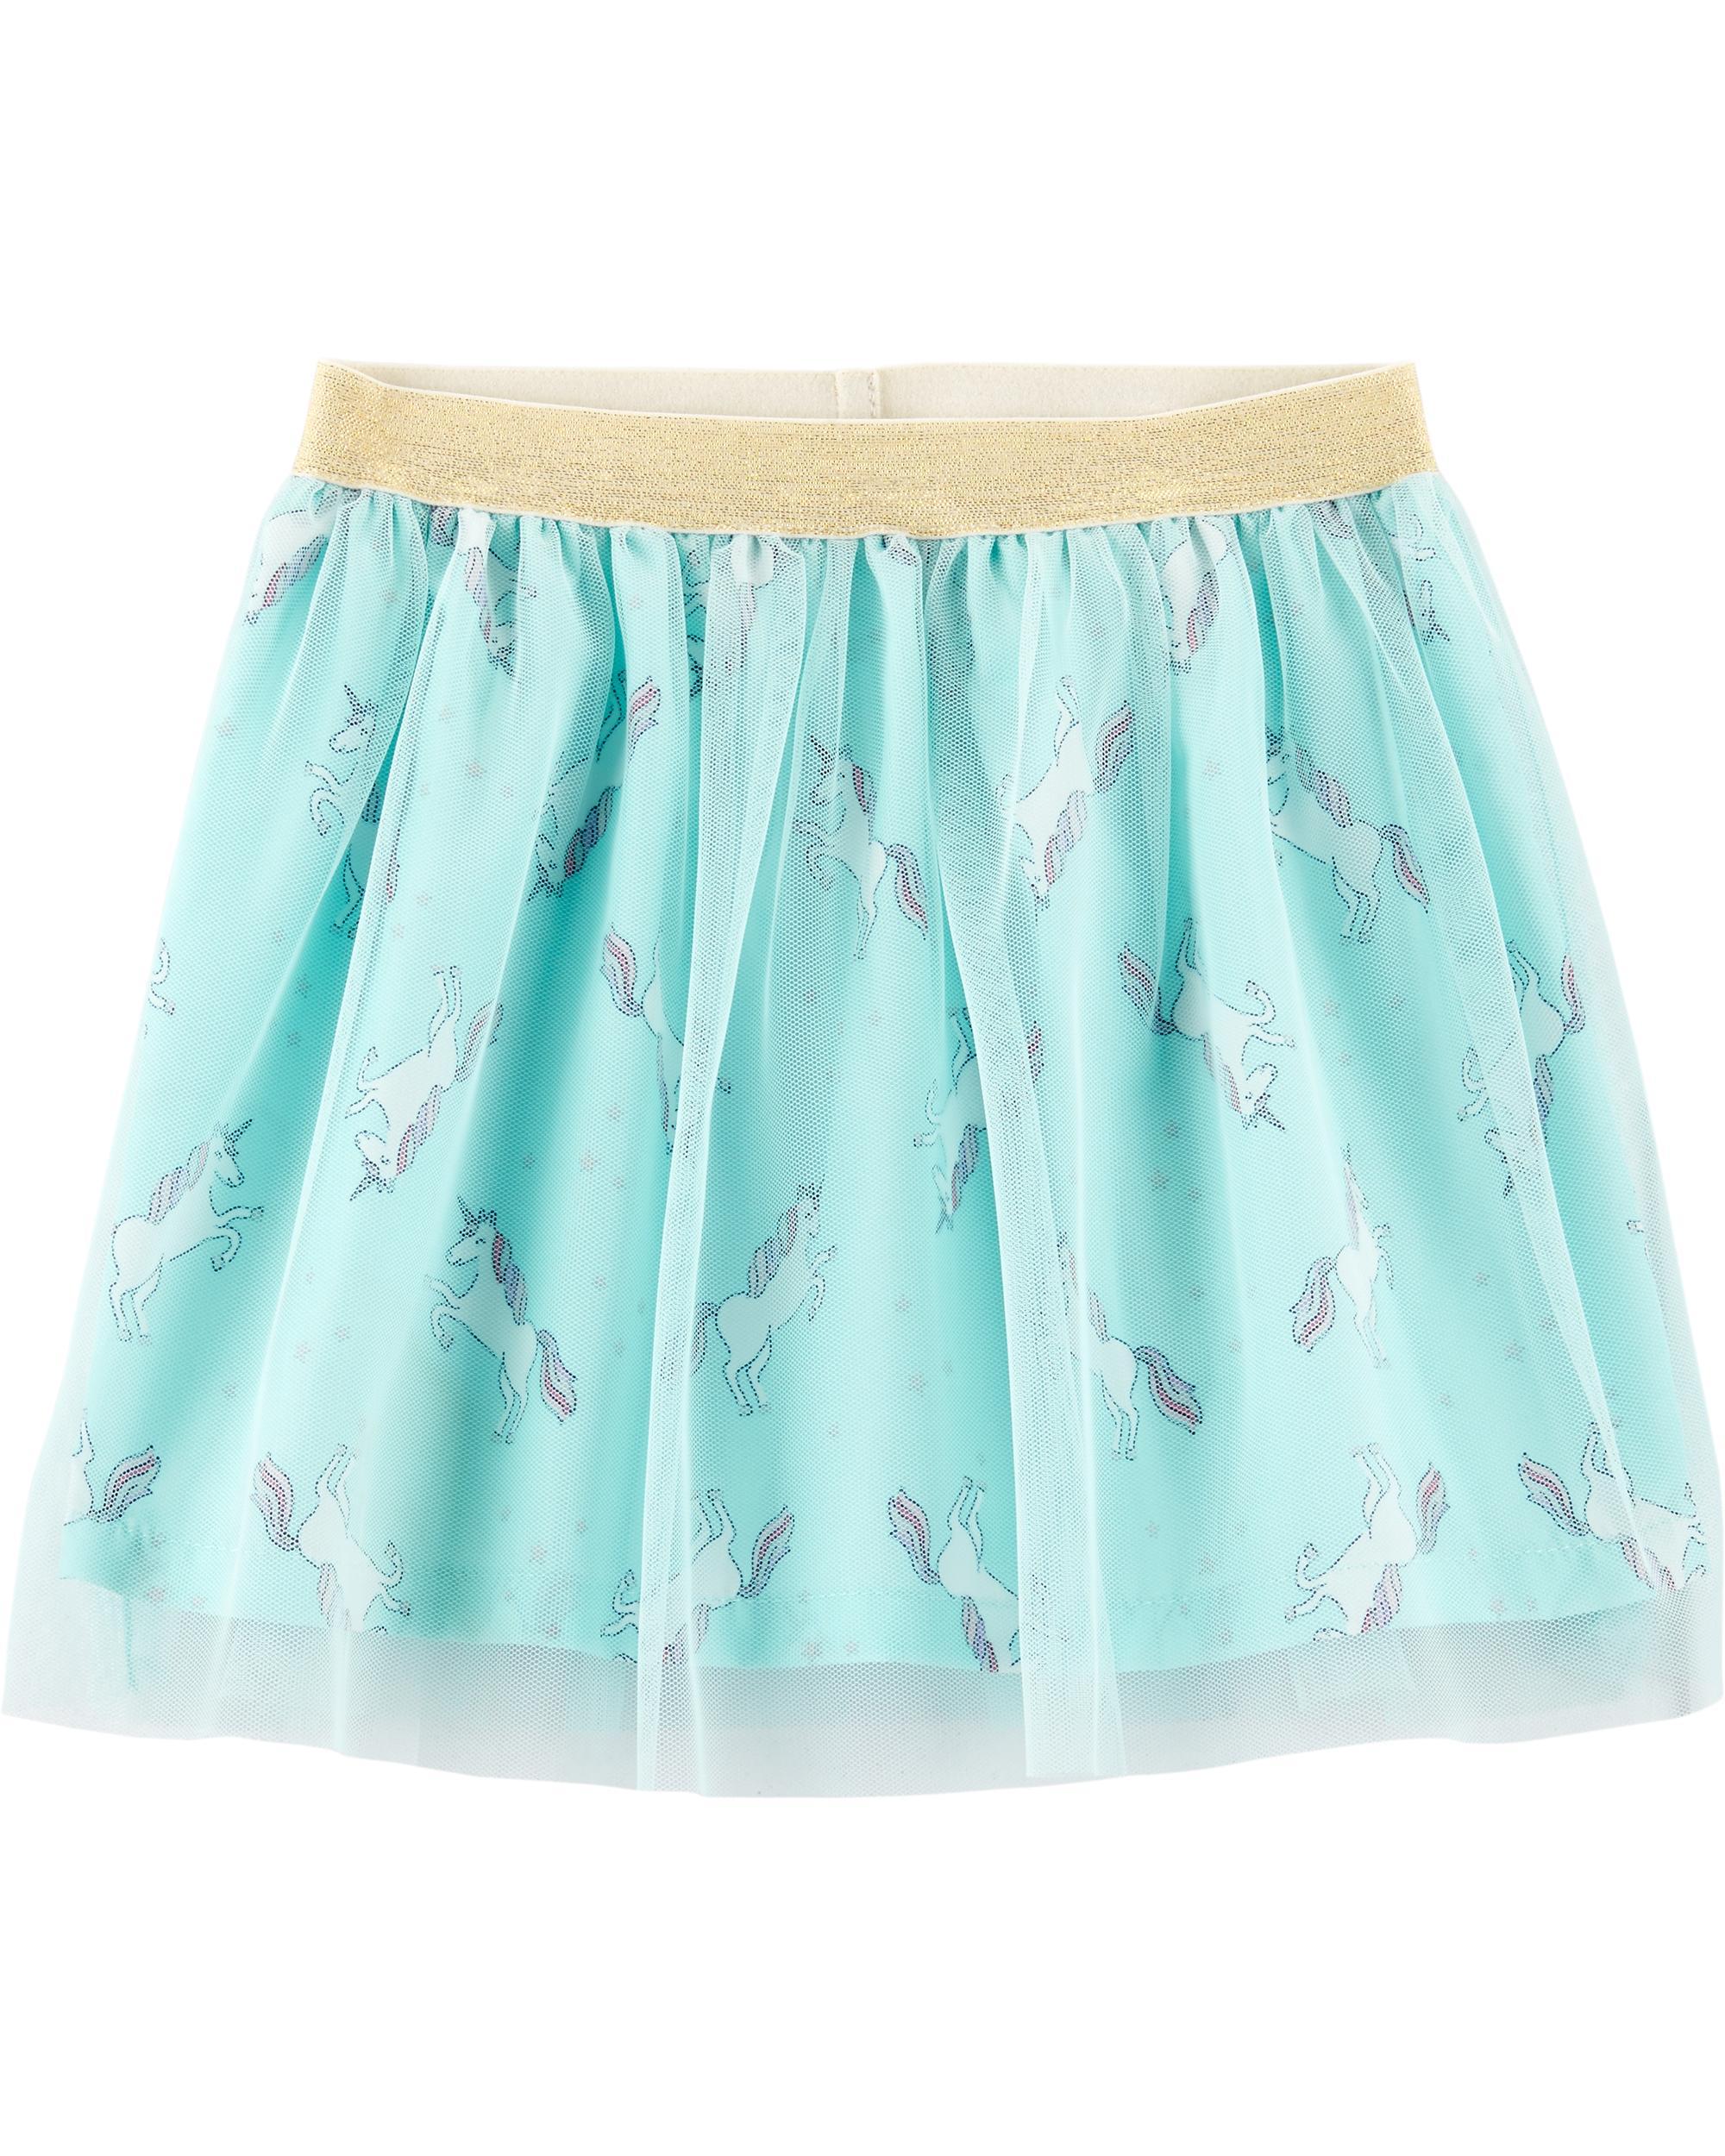 954c1f438dea0 Glitter Unicorn Tutu Skirt | carters.com